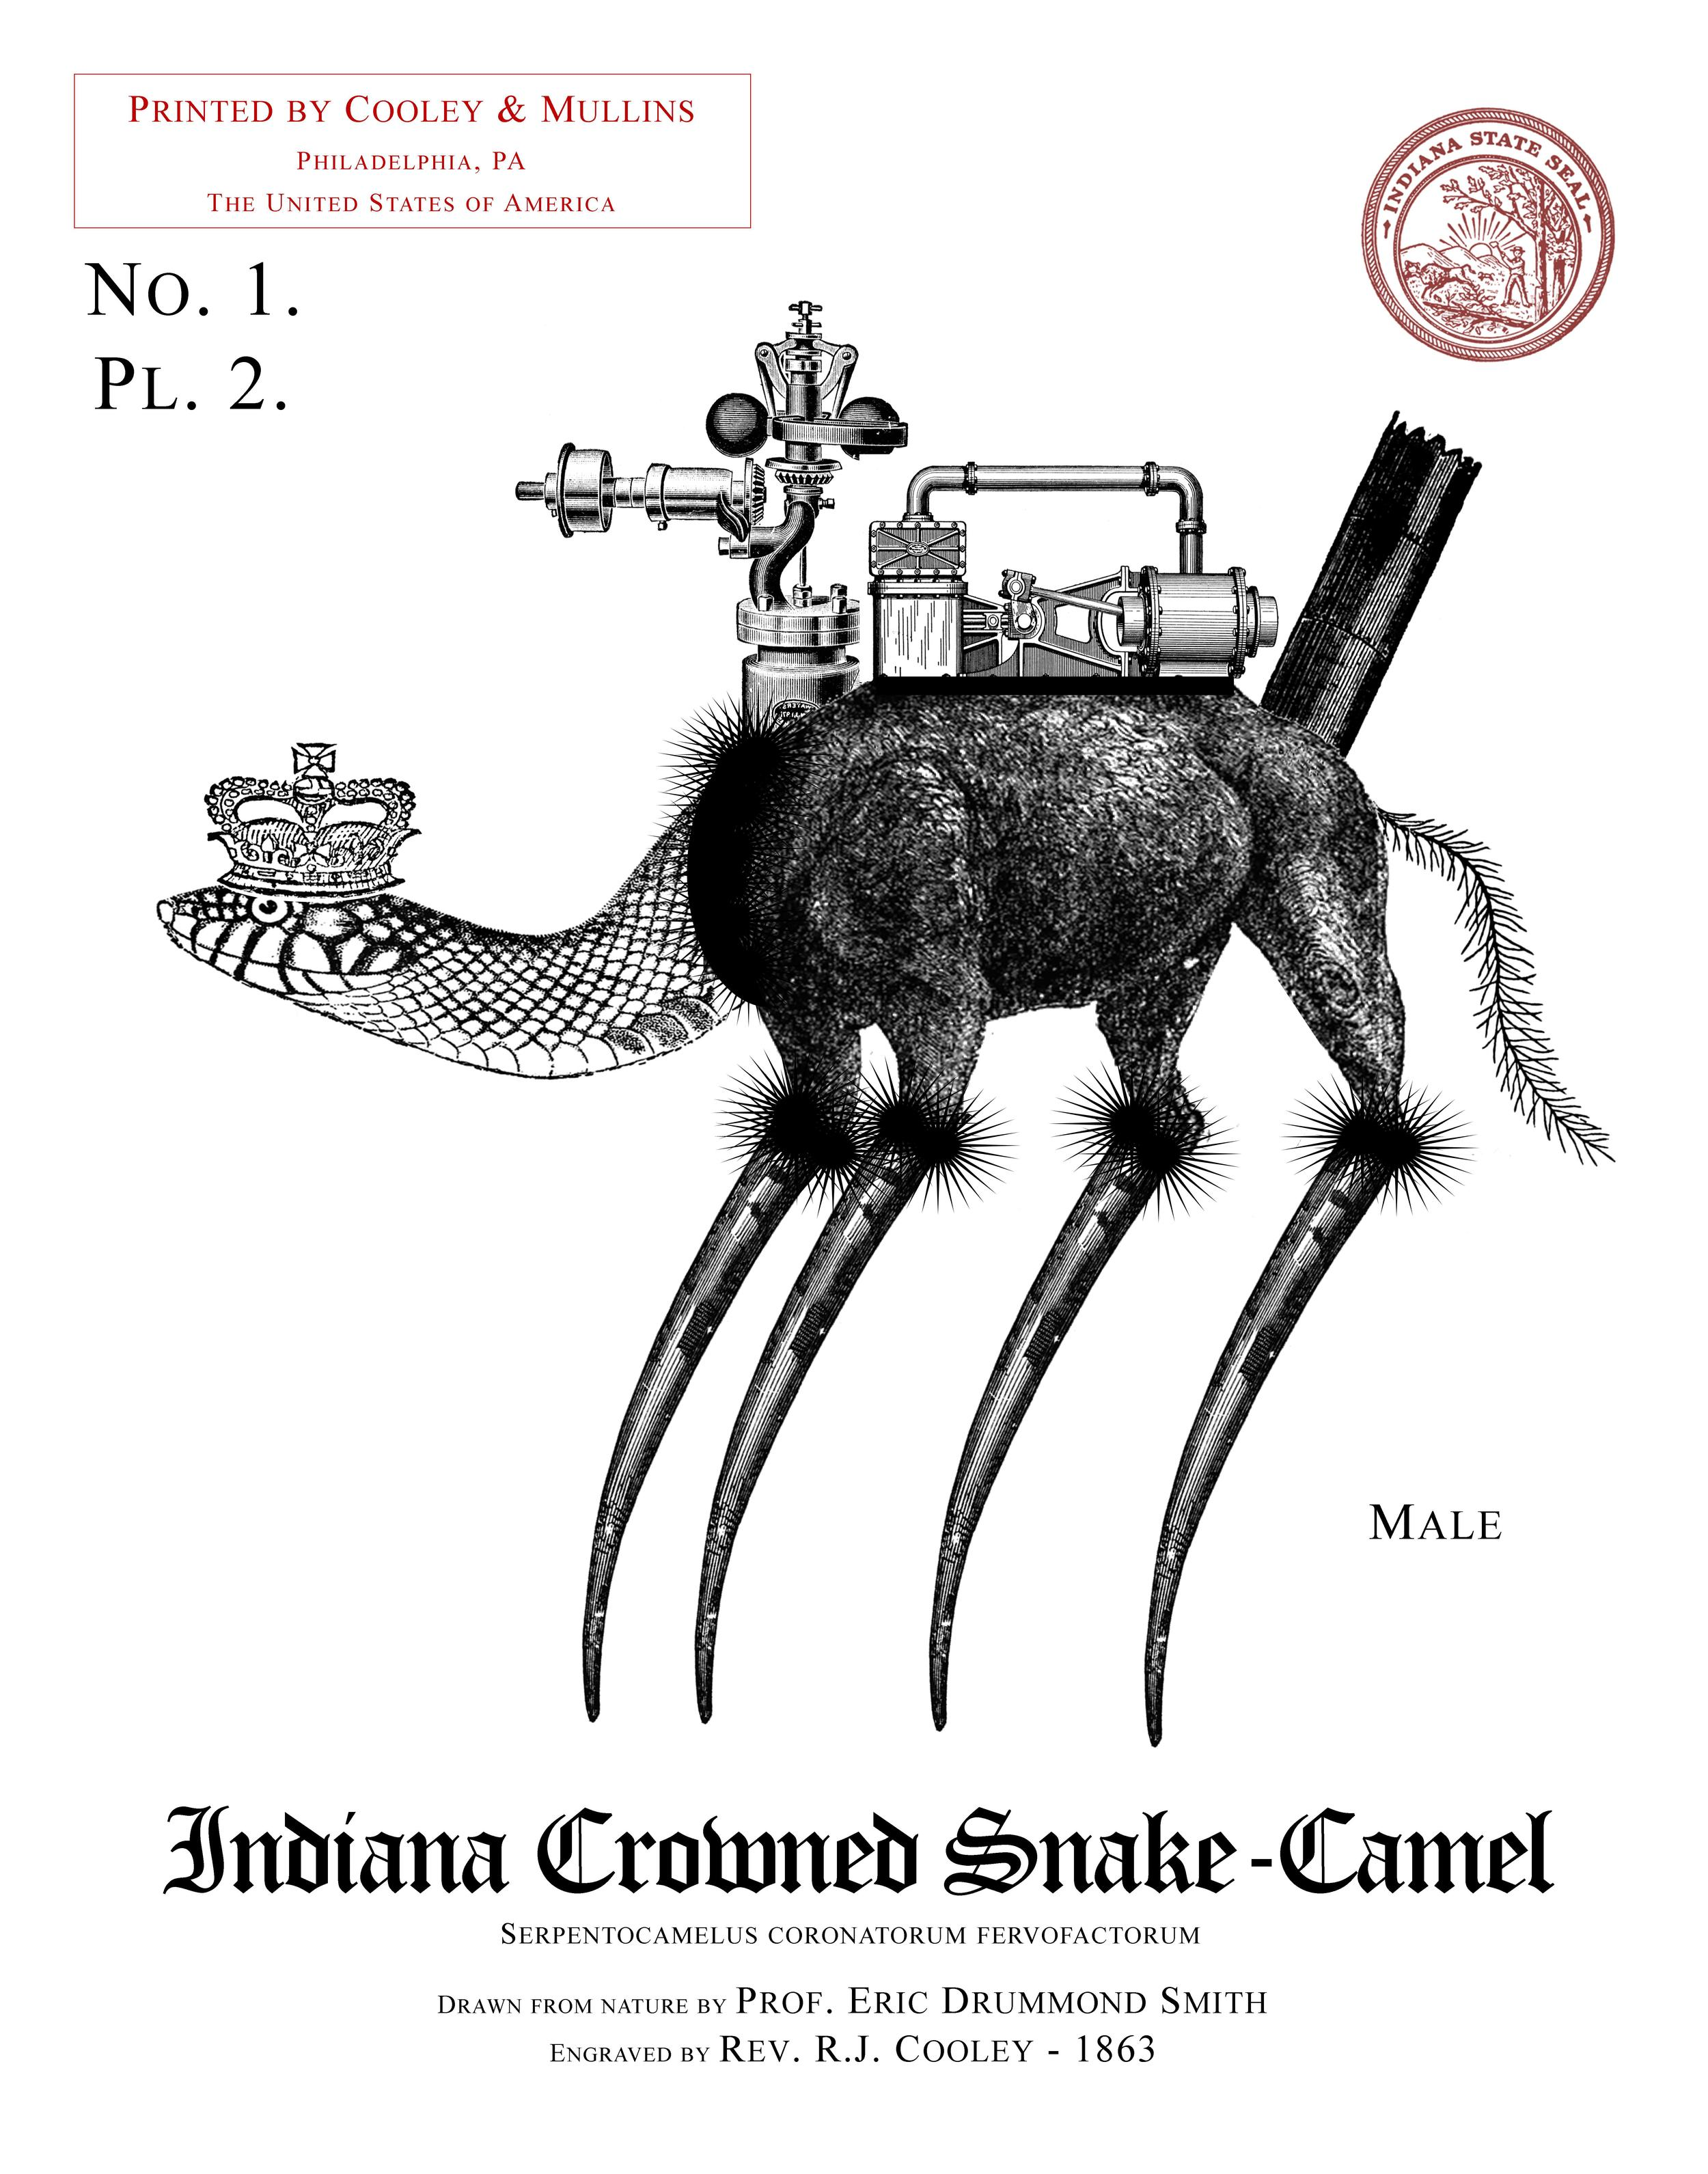 Indiana Crowned Snake-Camel